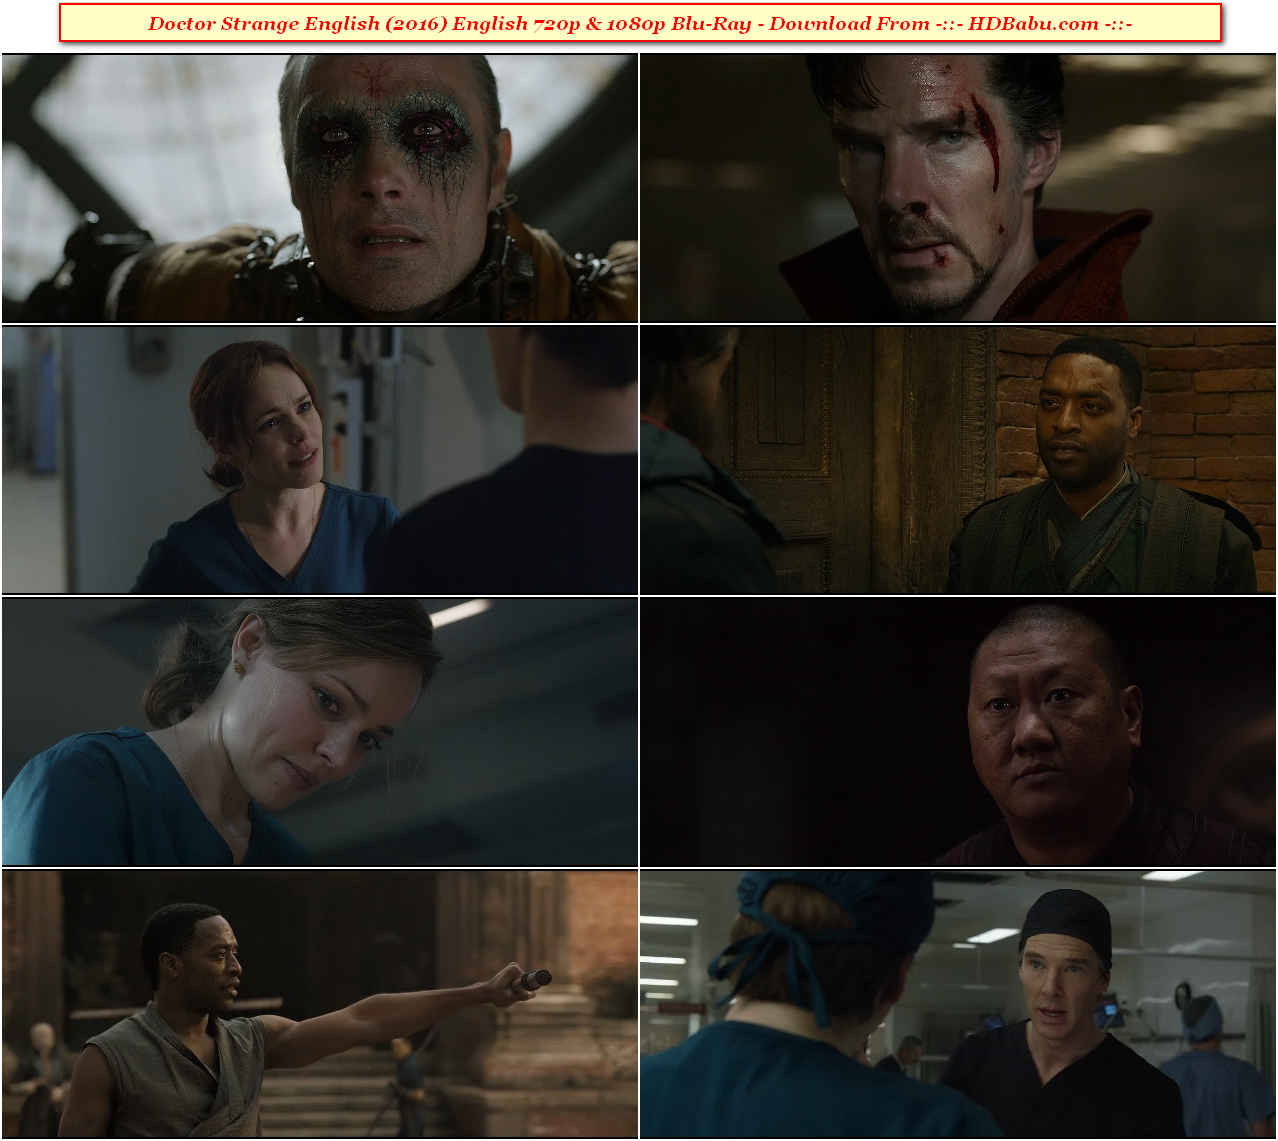 Doctor Strange English Full Movie Download